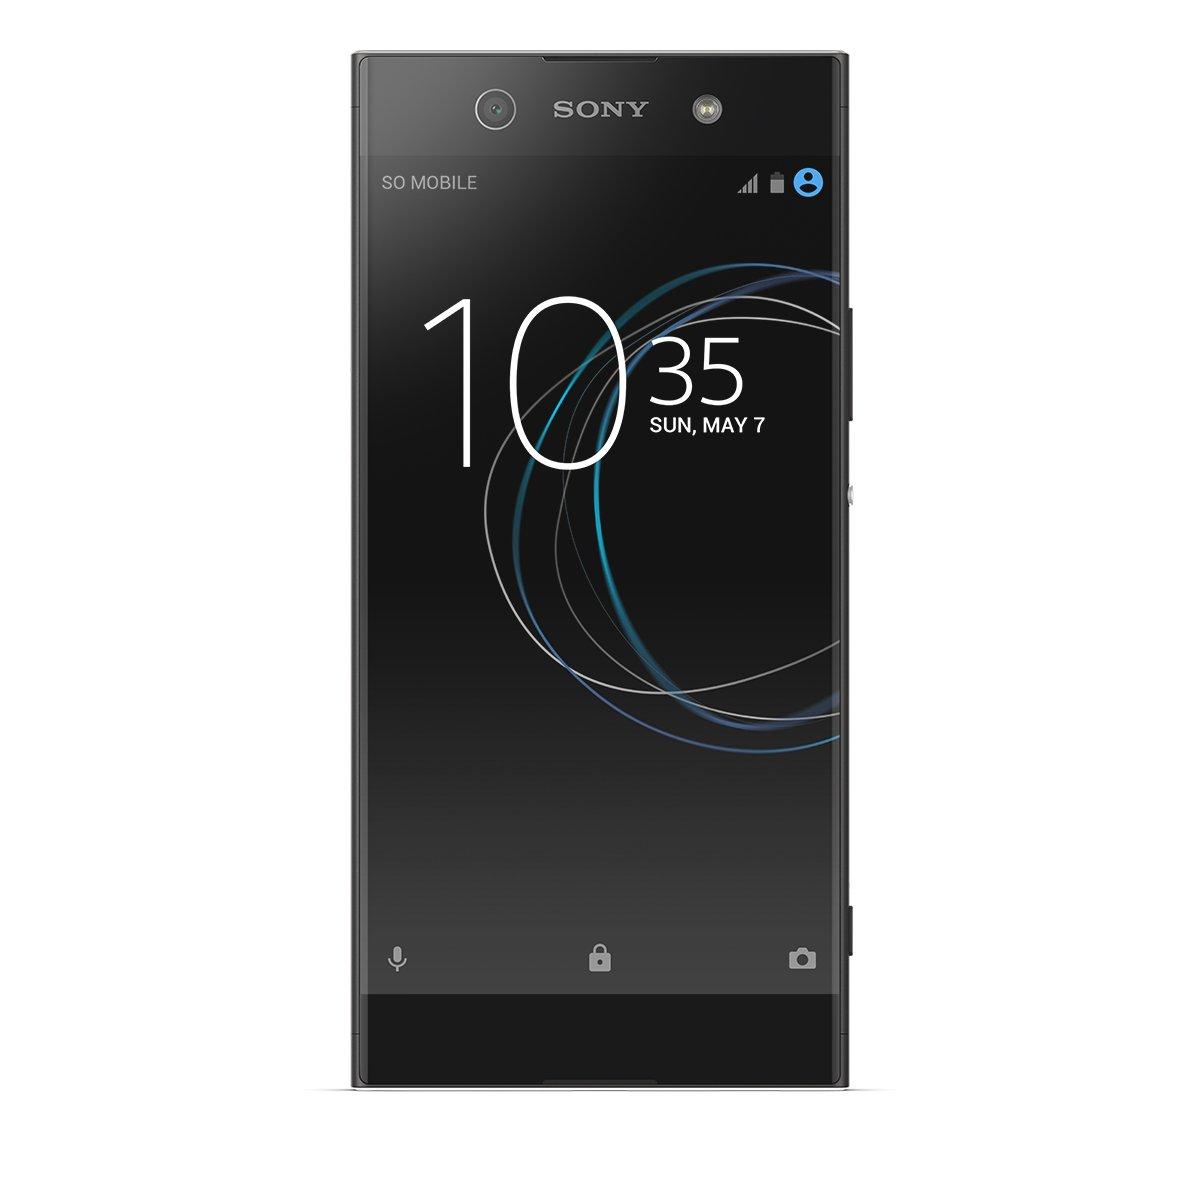 Sony Xperia XA1 Ultra - Smartphone con pantalla FULL HD de 6